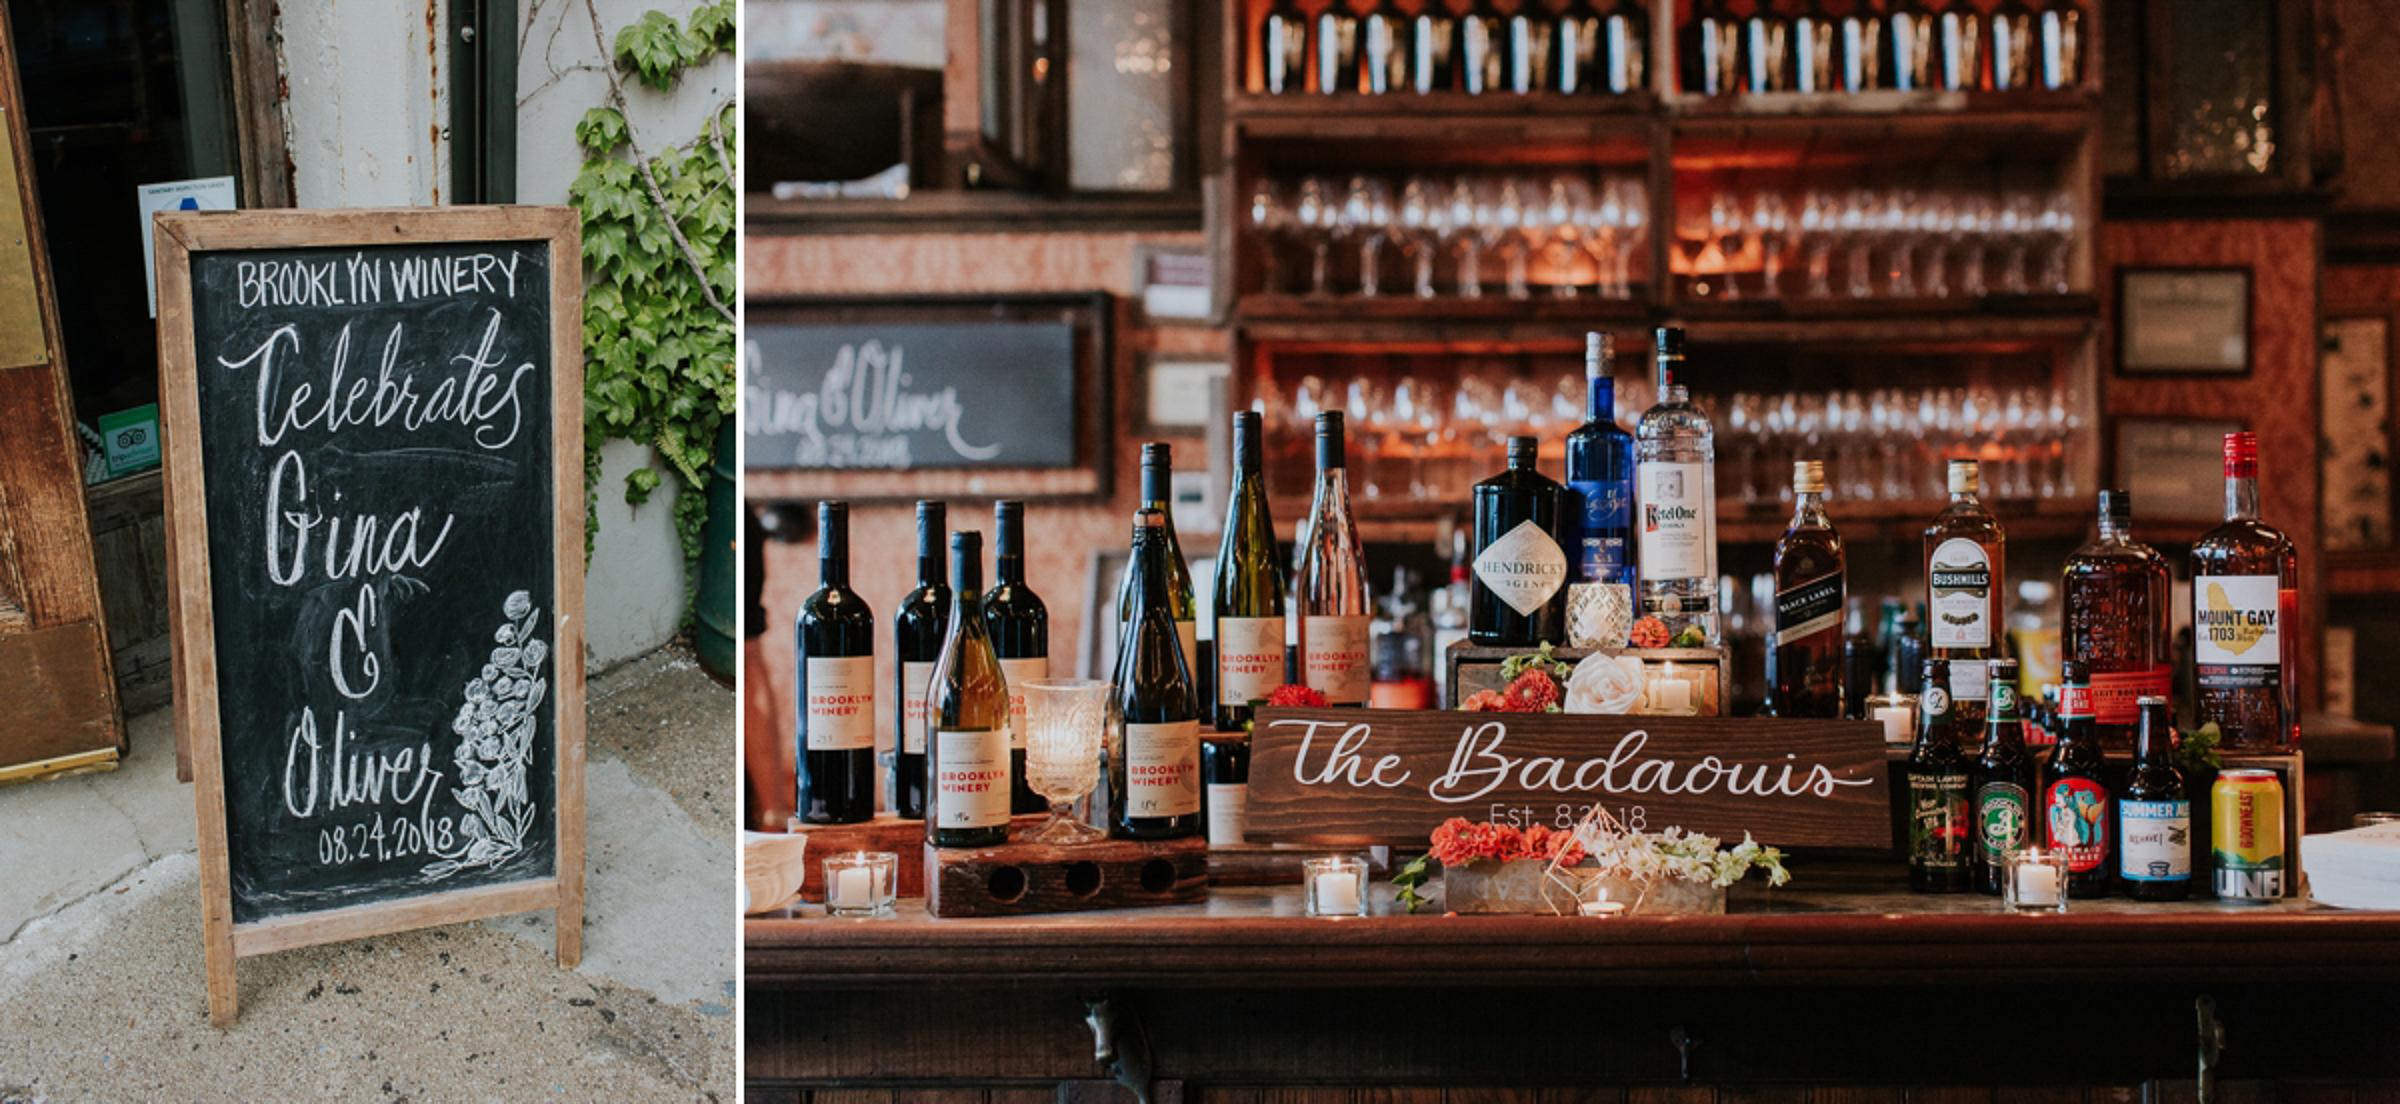 Brooklyn-Winery-NYC-Editorial-Documentary-Wedding-Photographer-Gina-Oli-123.jpg